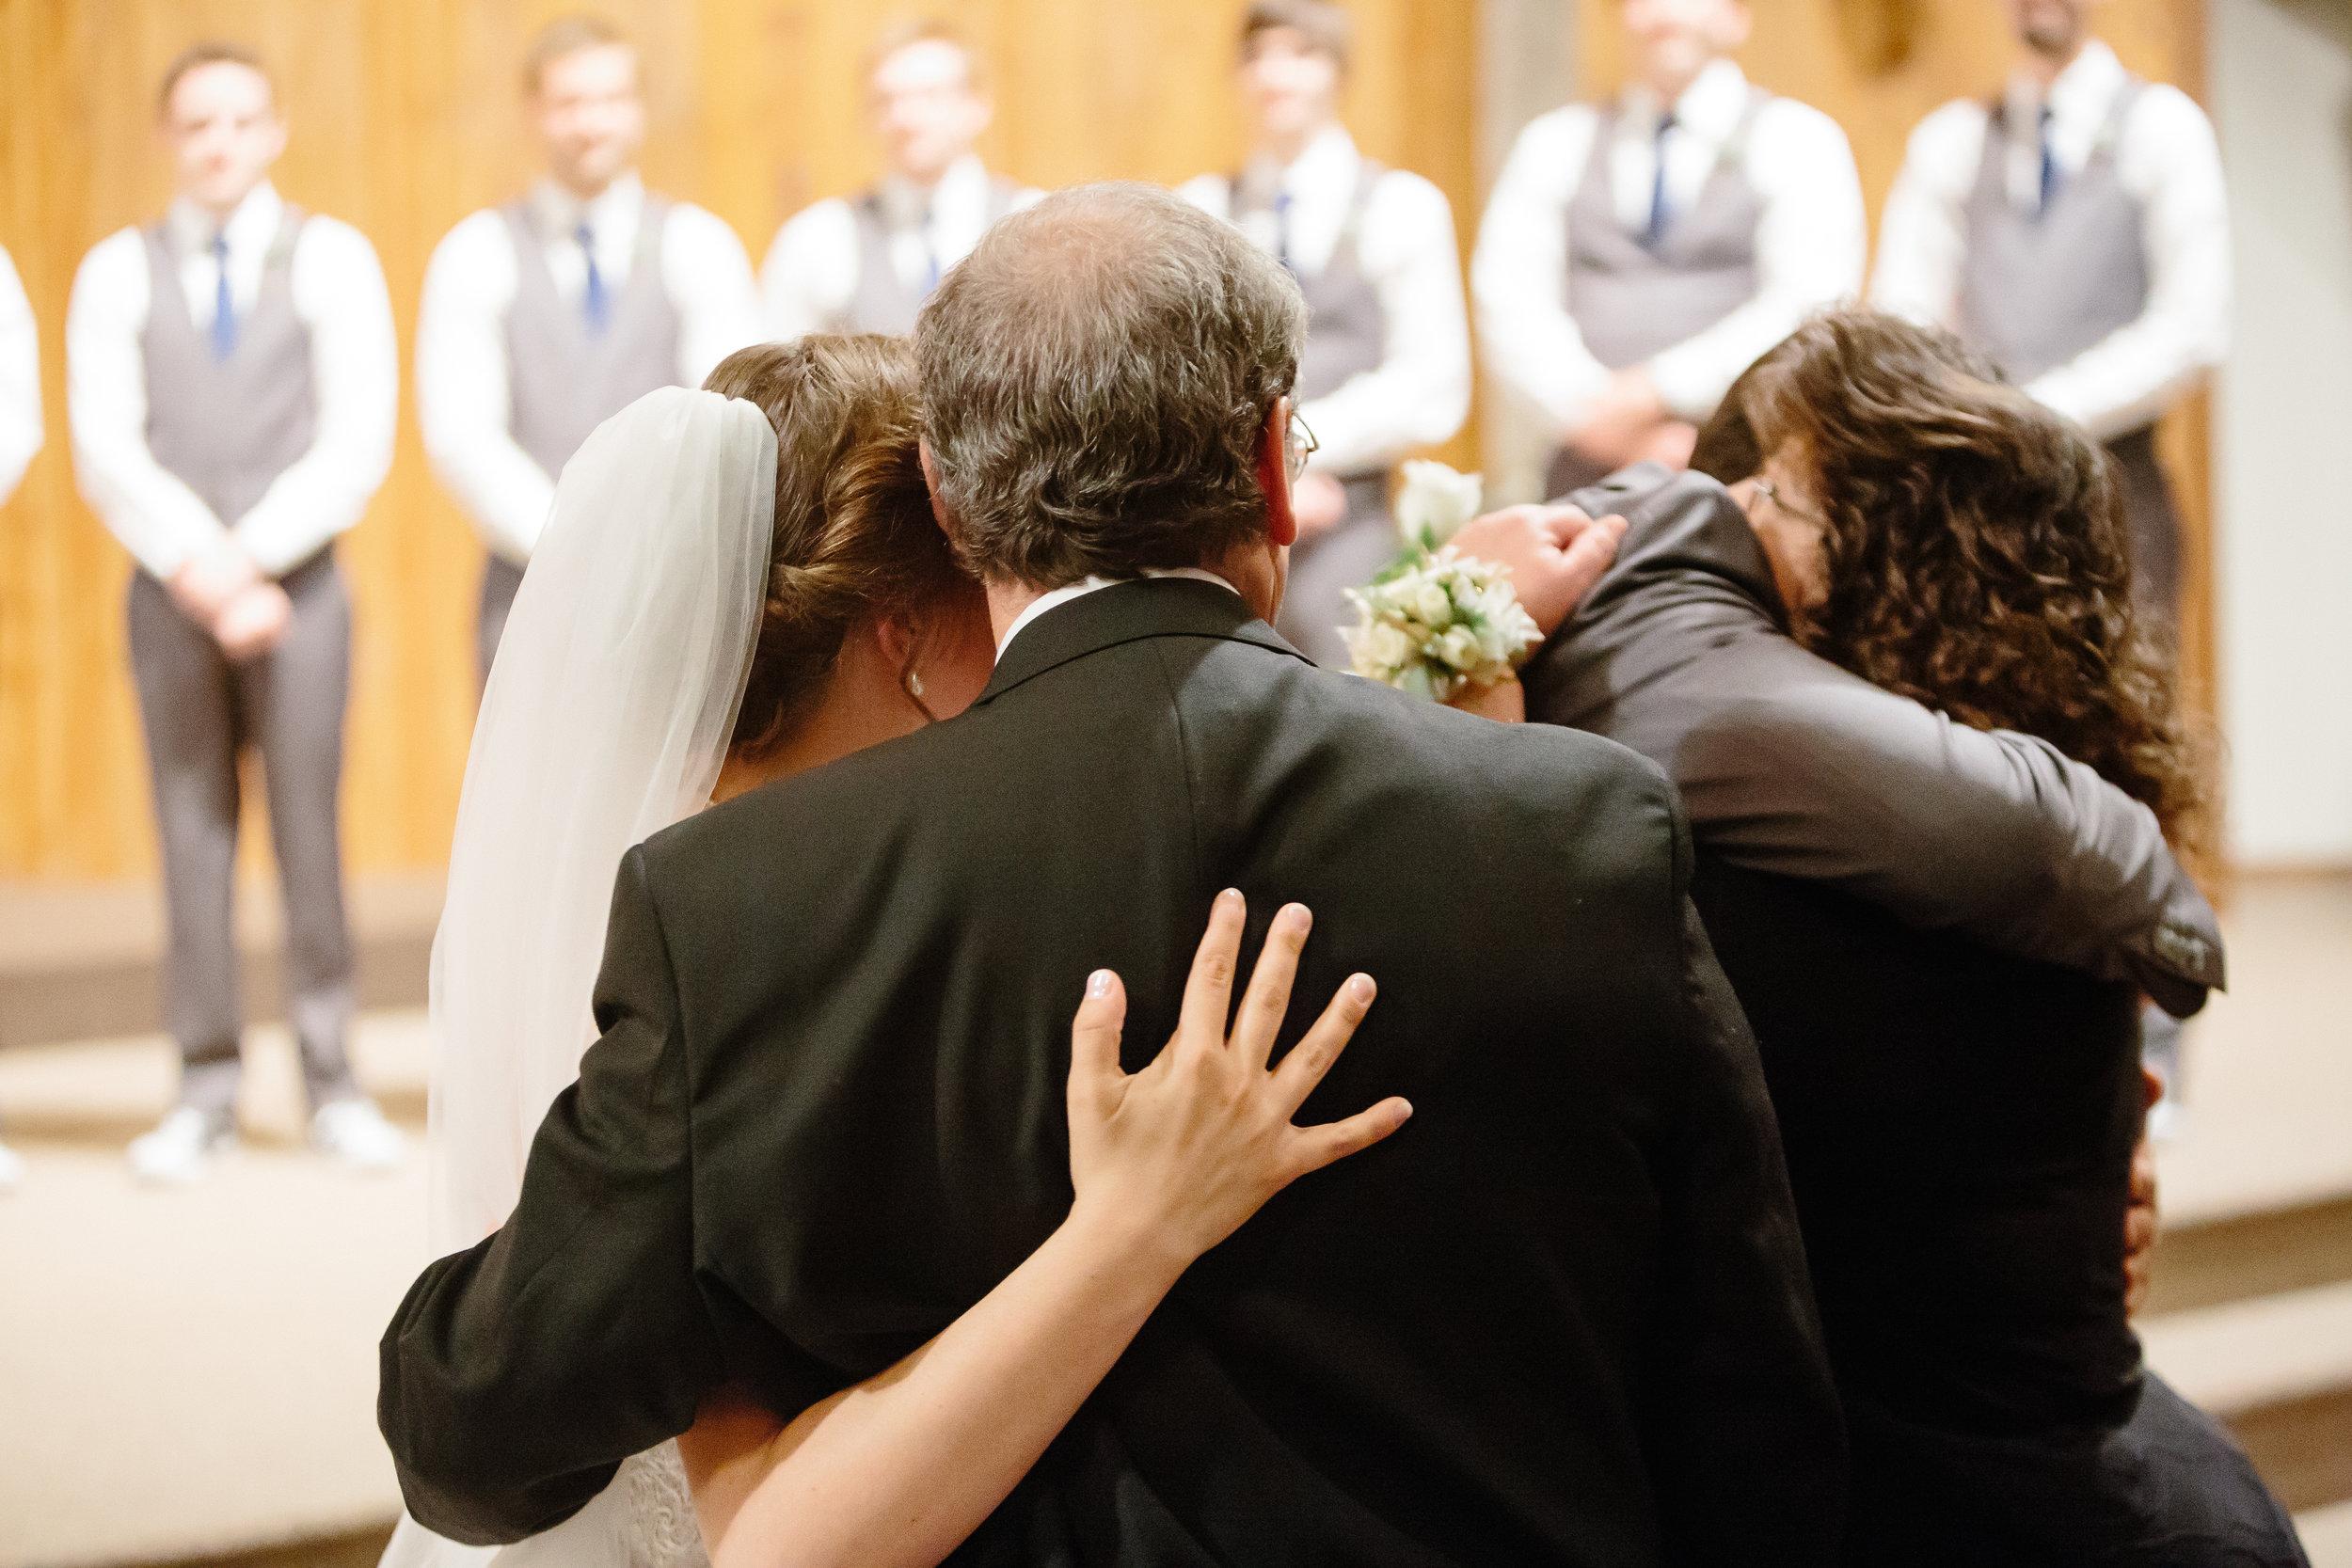 Jordan & Shantel Married - Idaho - Corrie Mick Photography-213.jpg